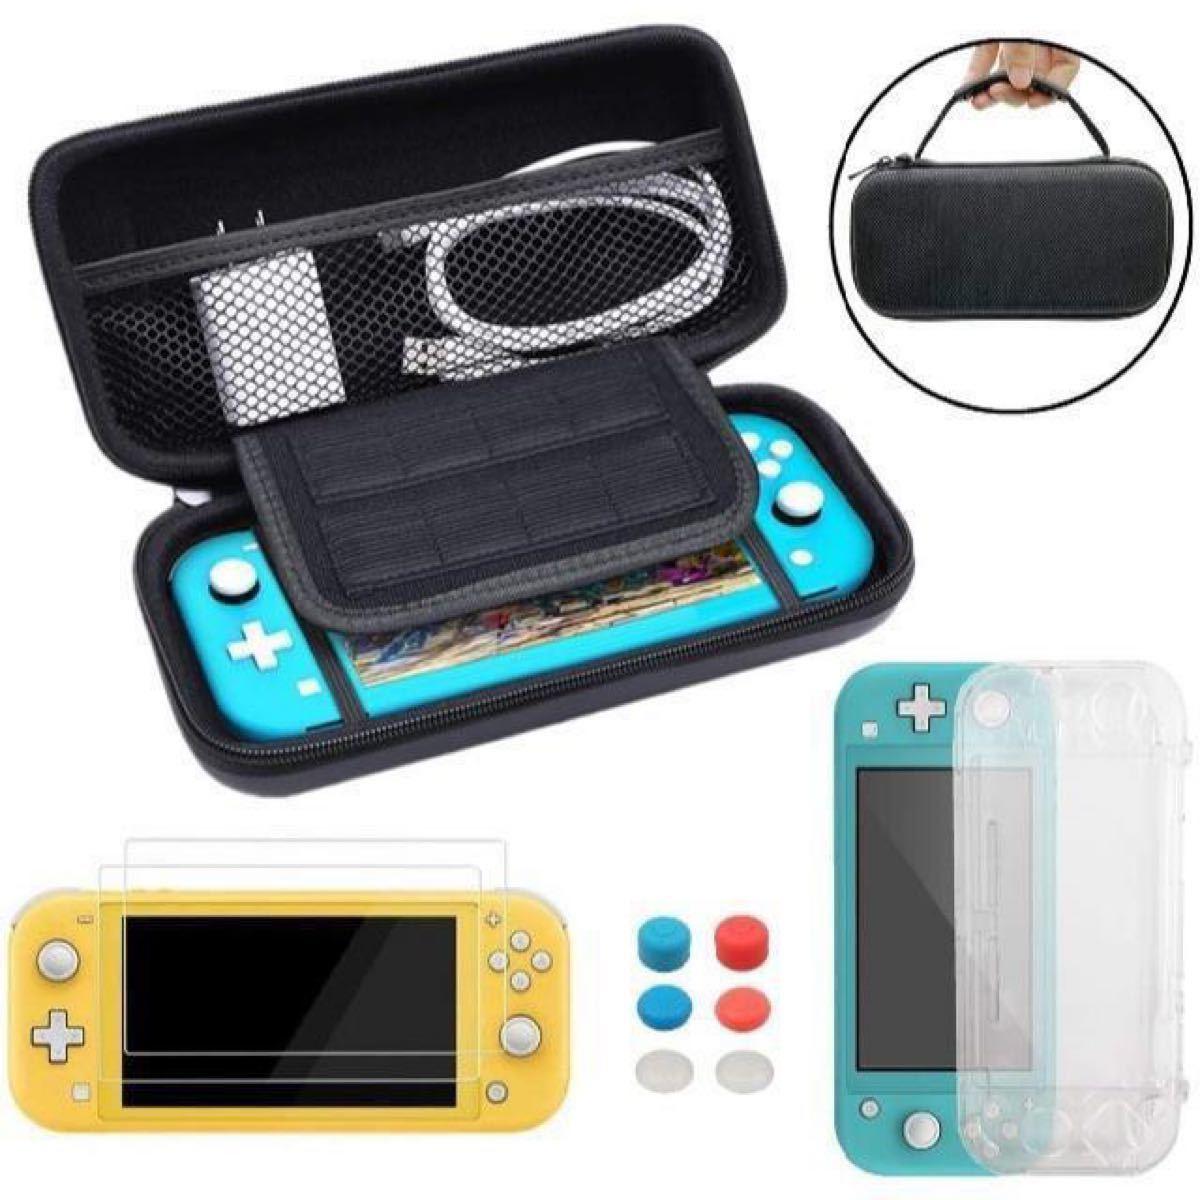 Nintendo Switch 任天堂スイッチケース 任天堂スイッチ